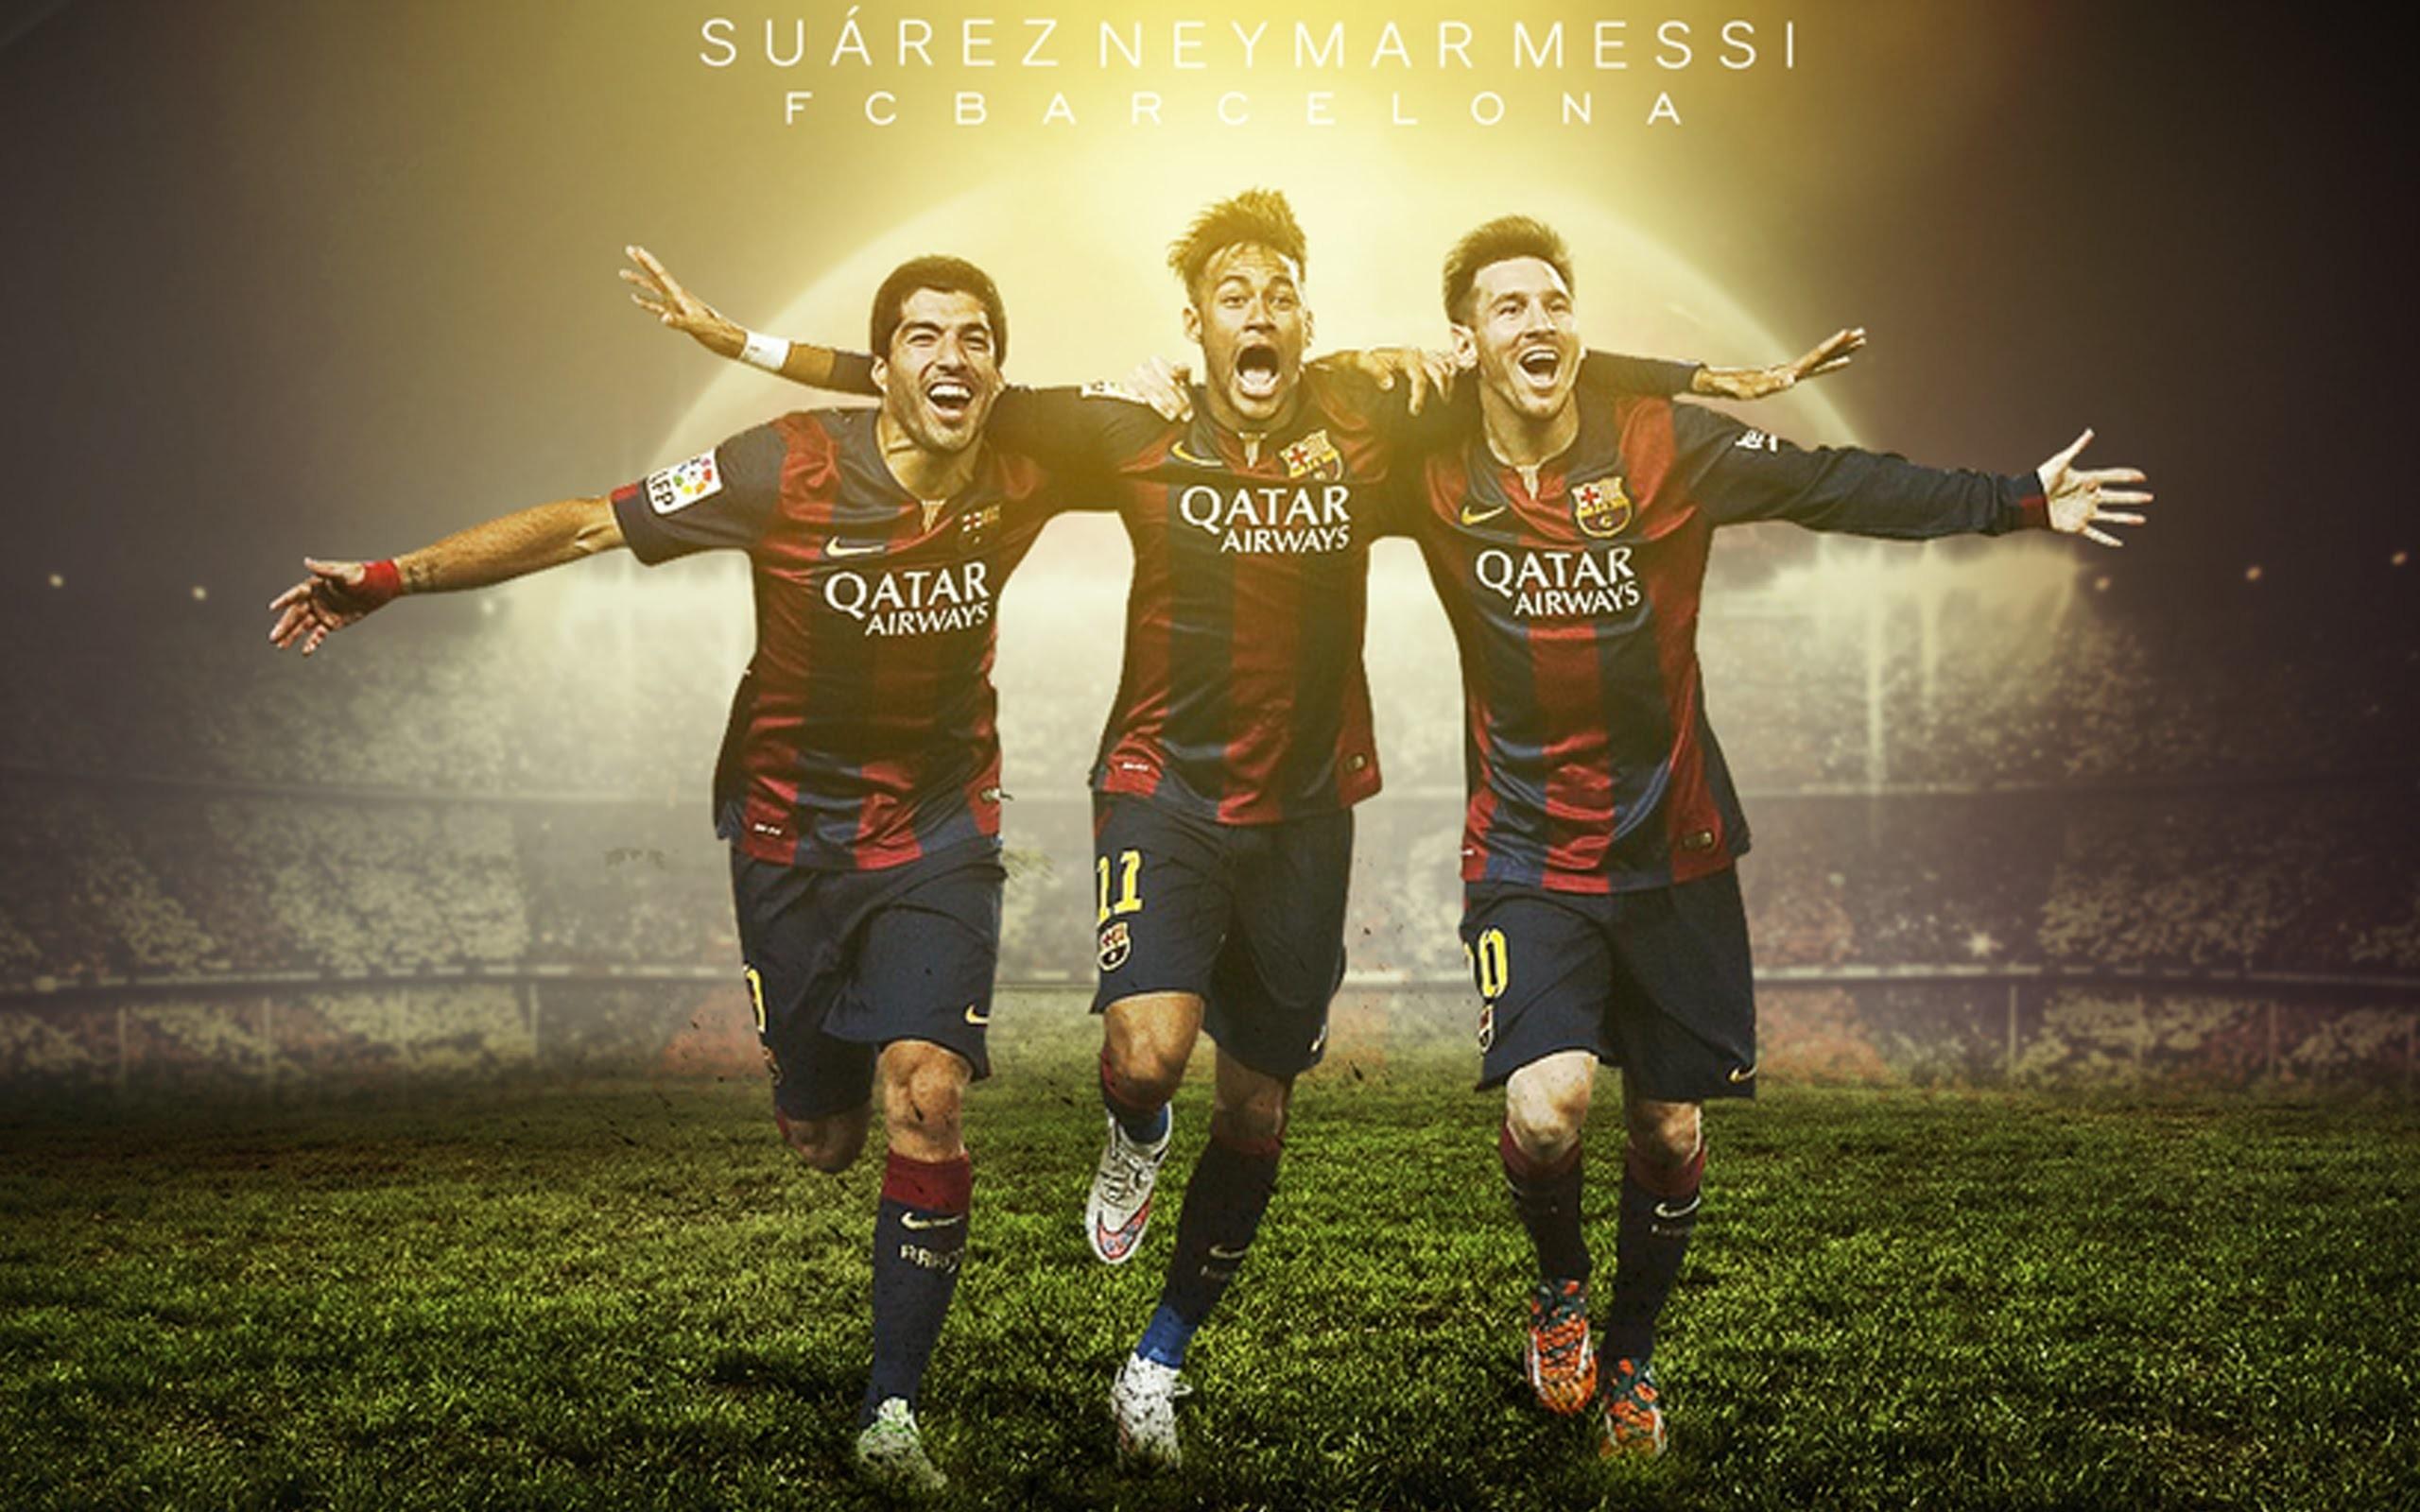 Suarez Neymar Messi Wallpaper Messi Neymar Suarez 126428